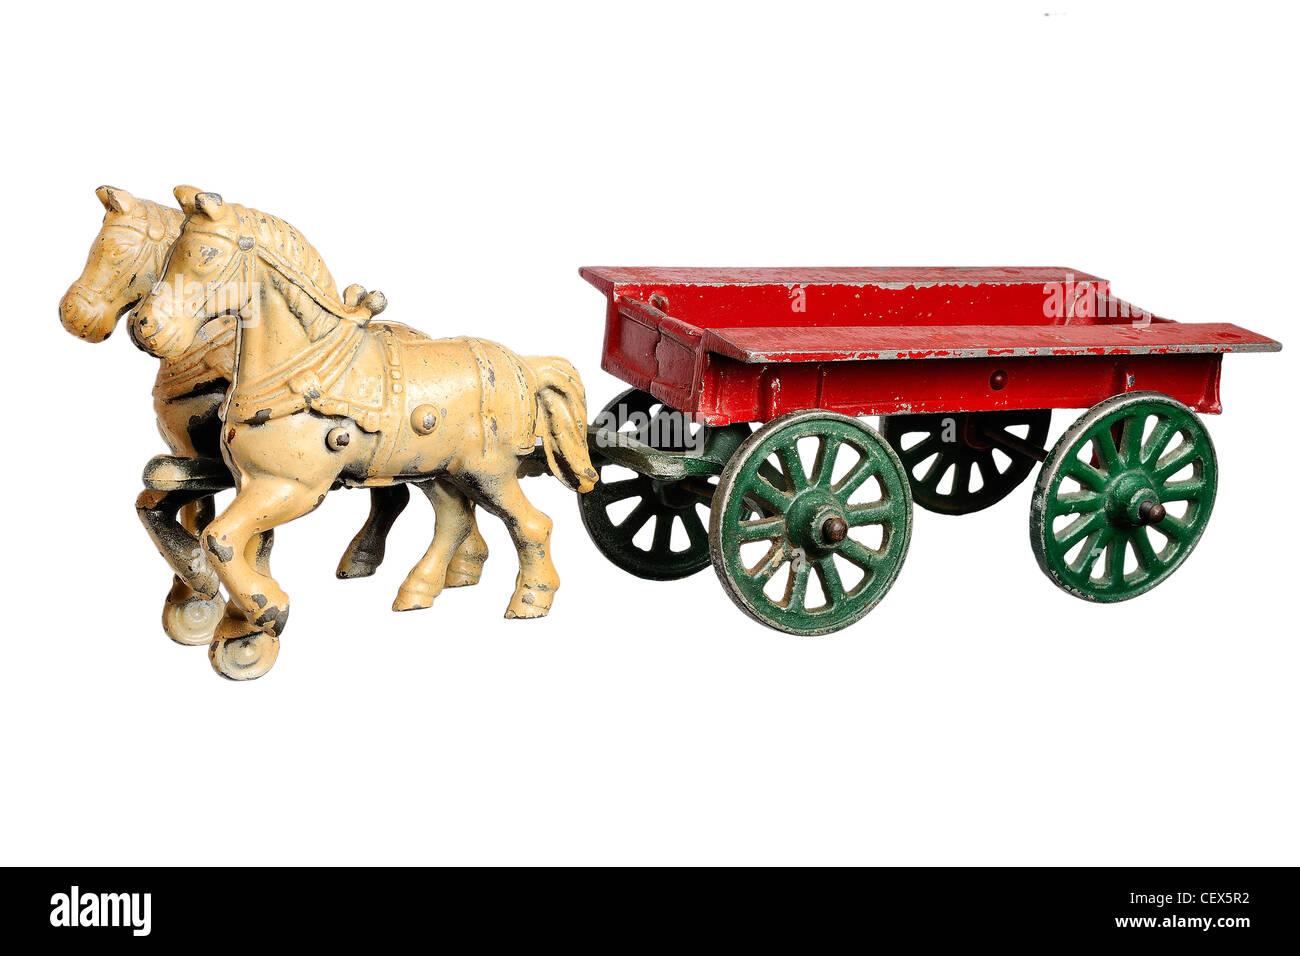 Horse Pulling Cart Children Stock Photos & Horse Pulling Cart ...